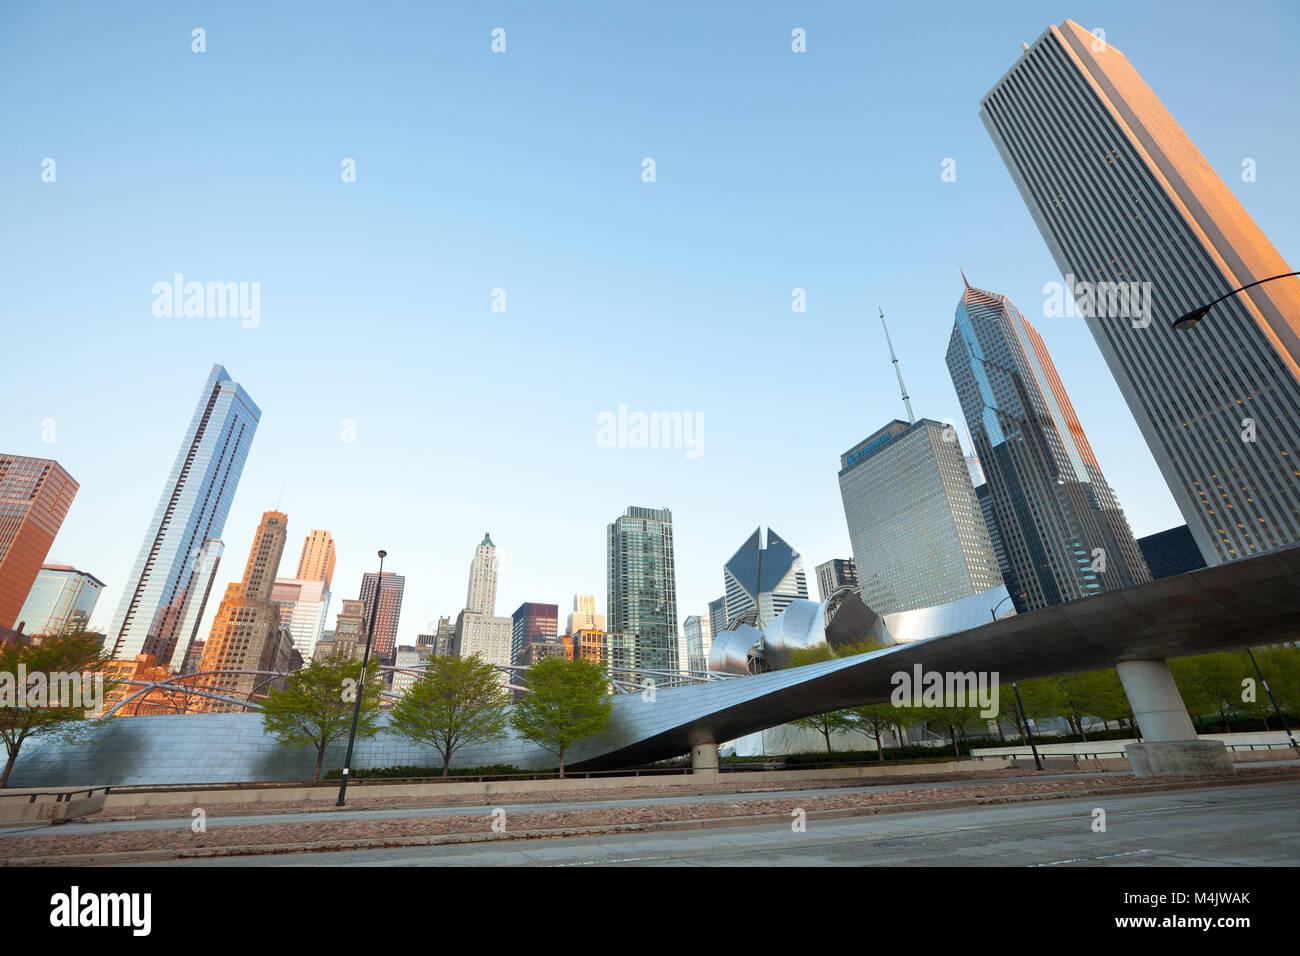 Chicago, Illinois, United States - Michigan Avenue skyline and BP Pedestrian Bridge in Chicago, Illinois, USA Stock Photo